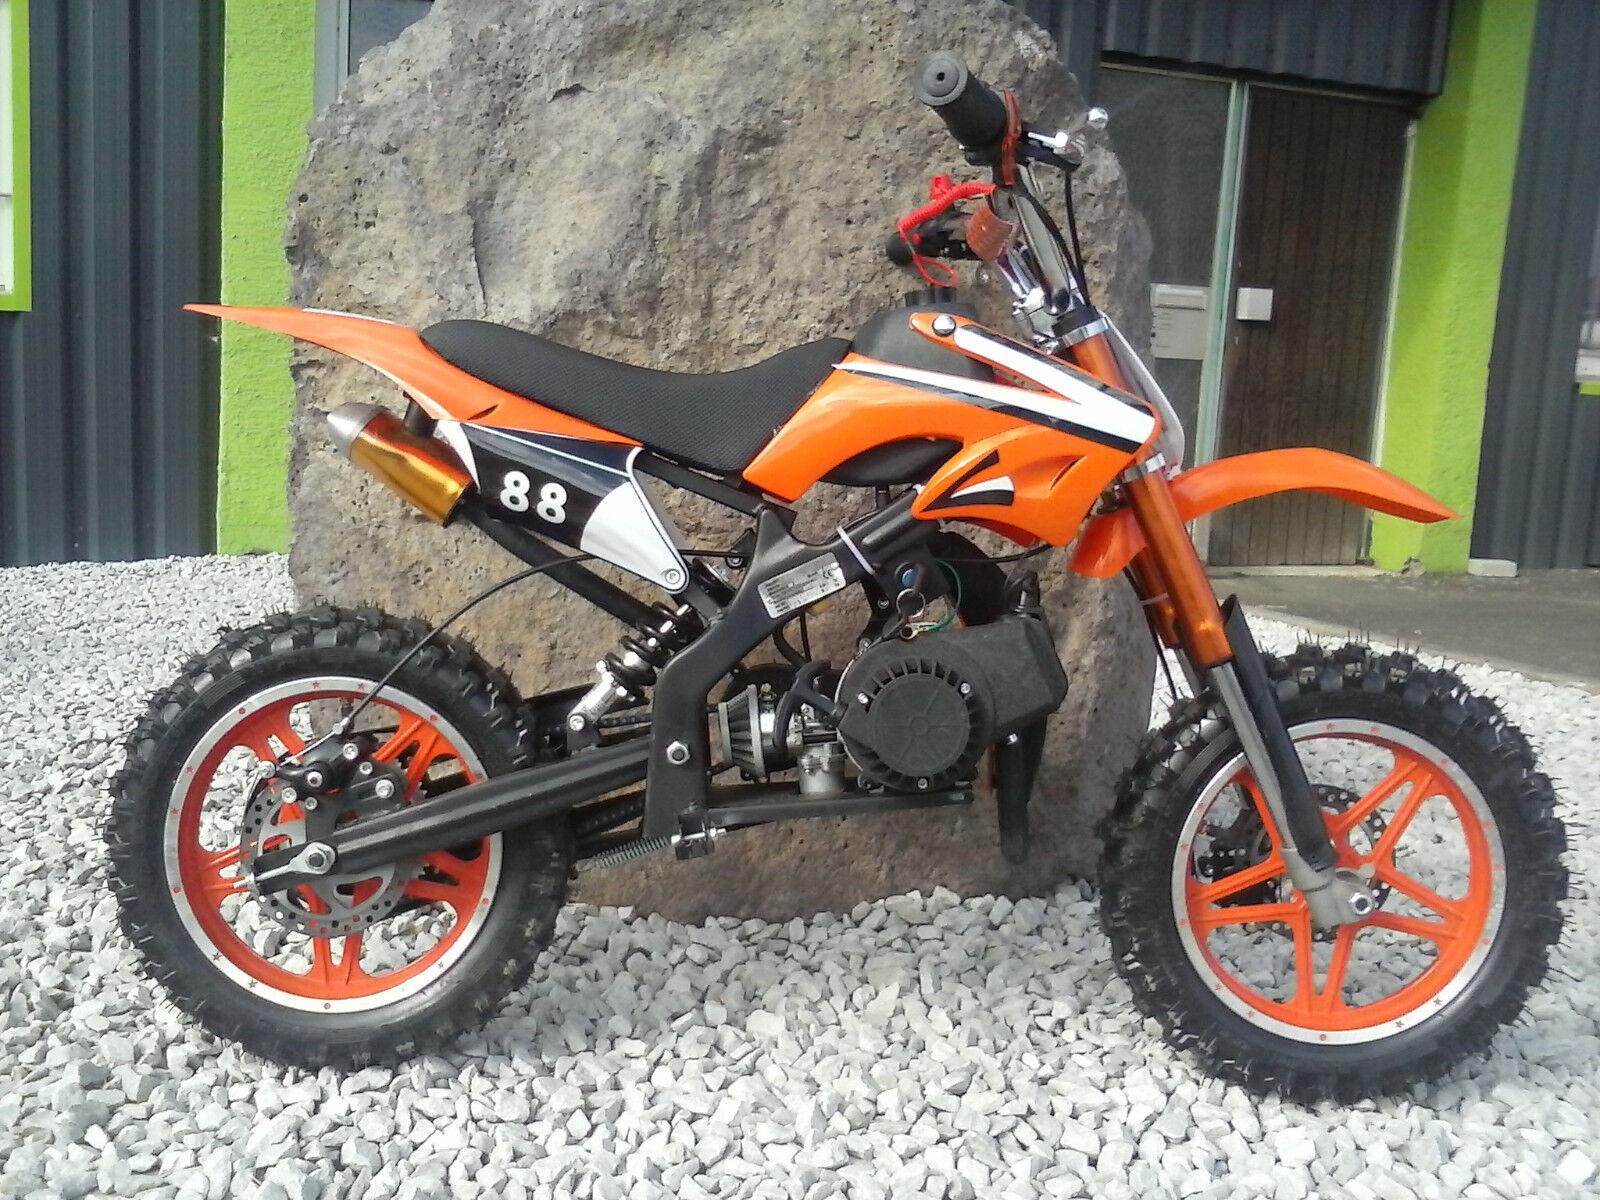 Big Bore 6 Tuningmotor Tuning Vergaser Pocketbike Cross Motor pocket Dirt Bike